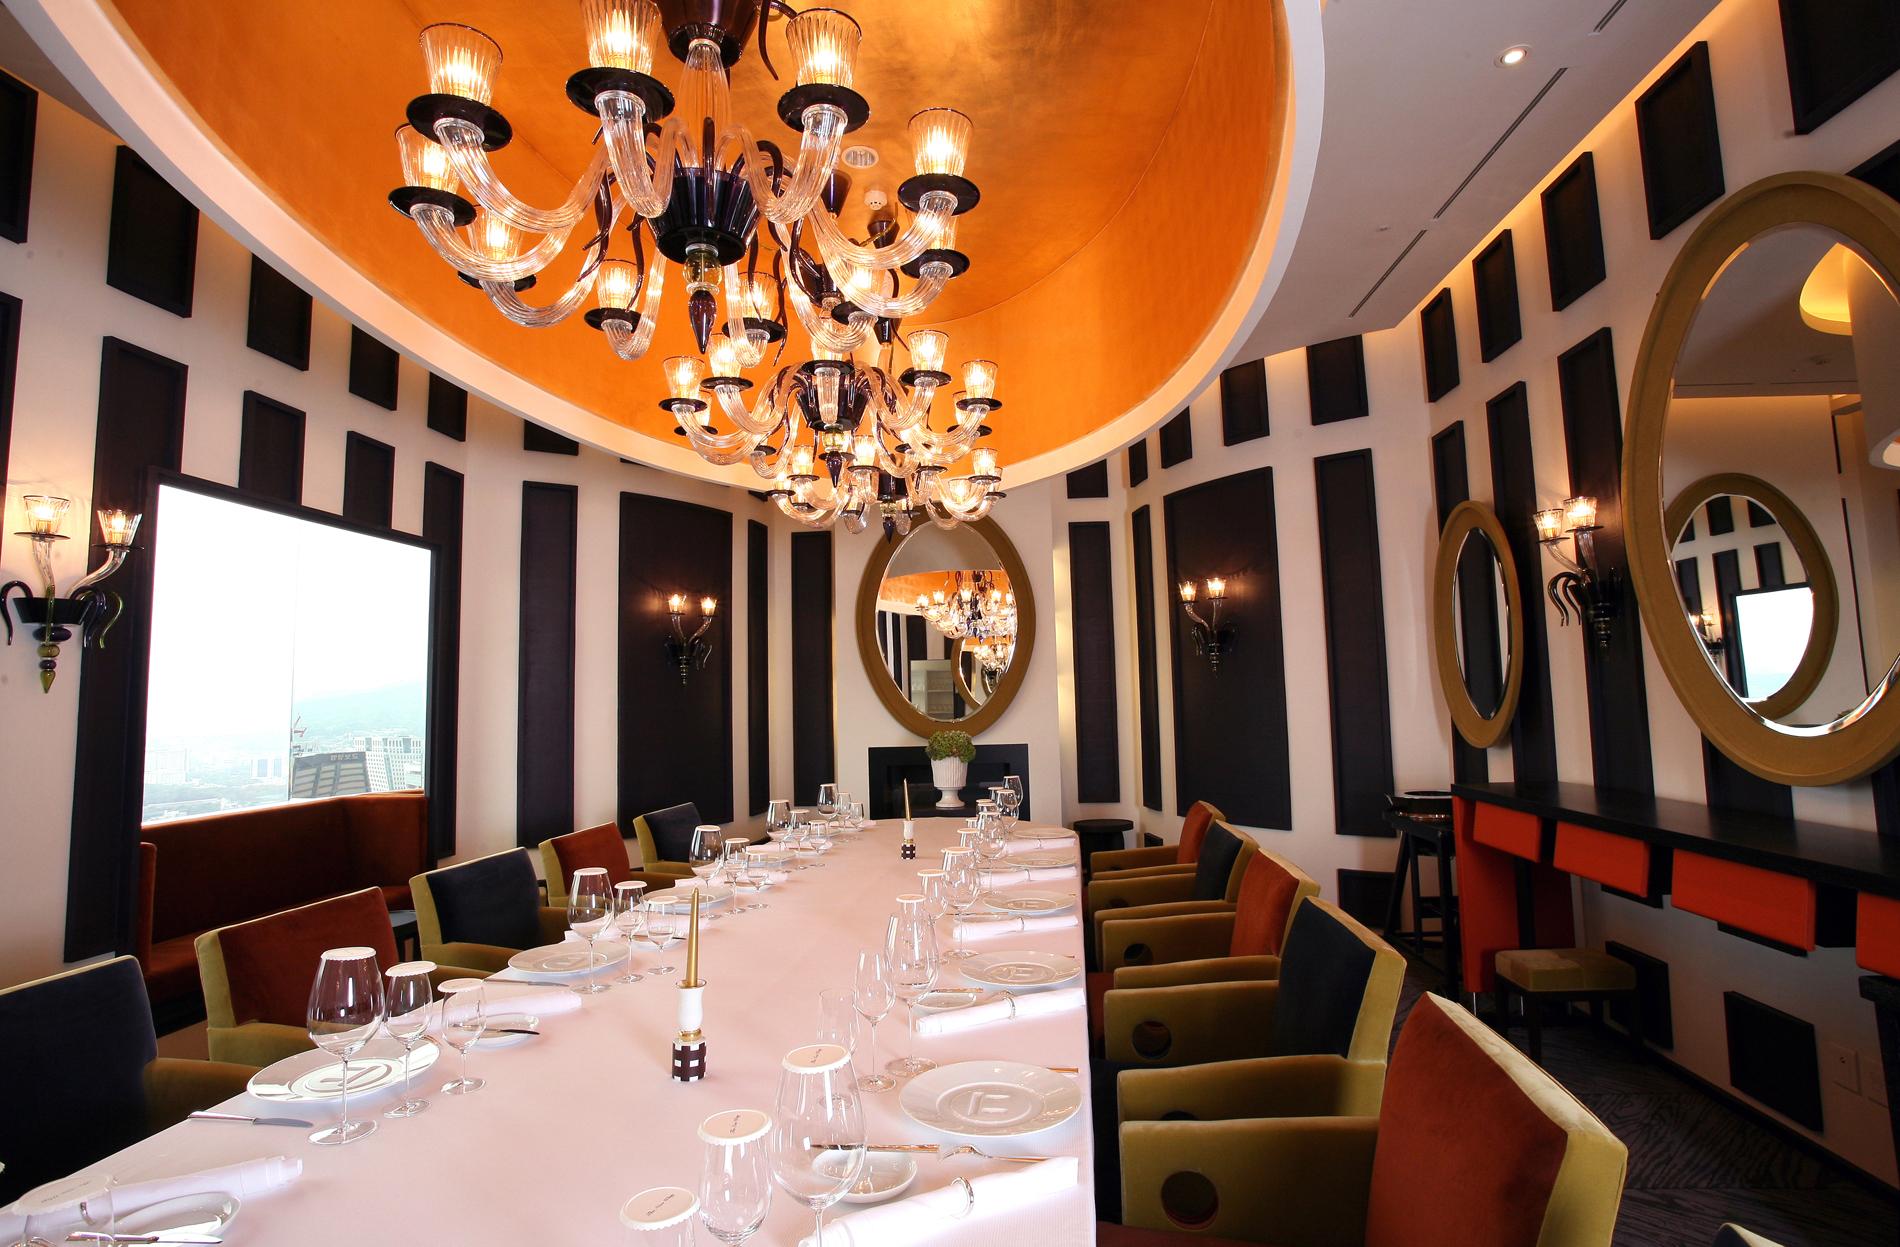 pierre-gagnaire-restaurant-seoul-olivier-gagnere-veronese-4